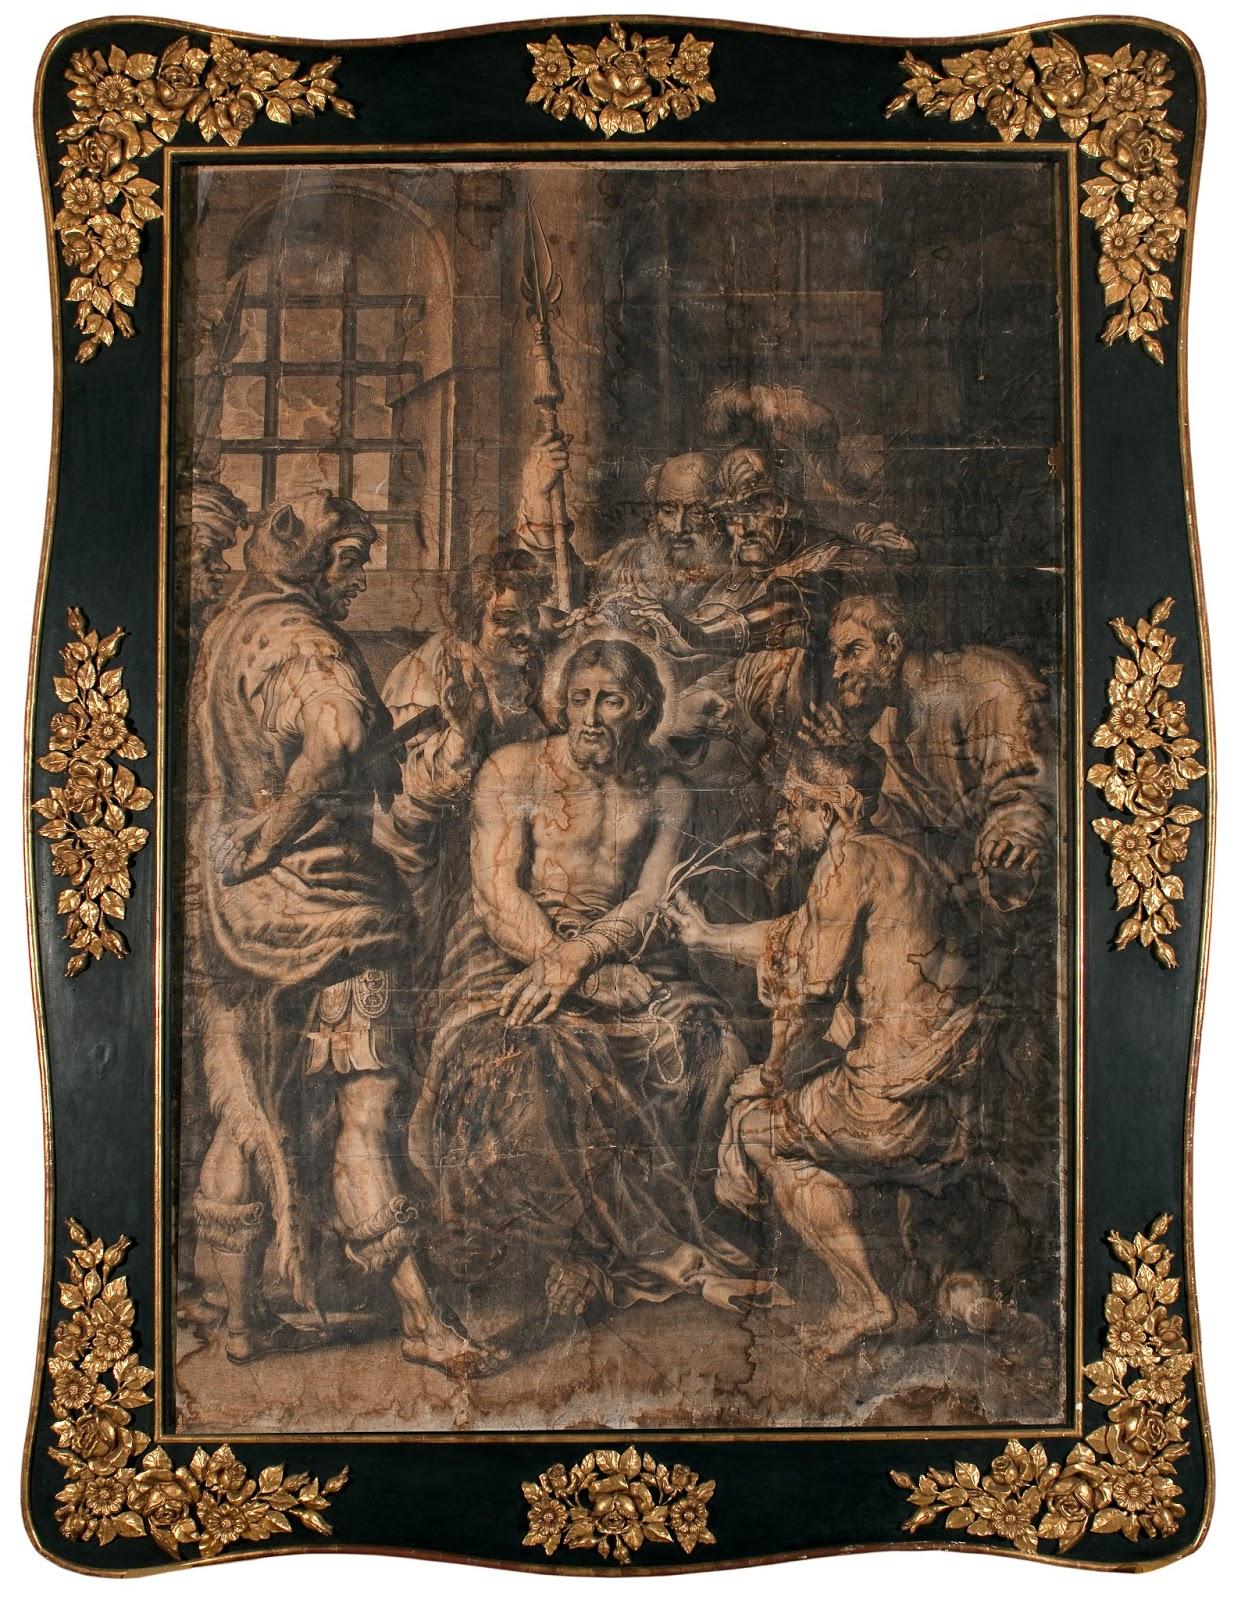 http://rfacdn.nz/artgallery/assets/media/blog-mocking-christ-1.jpg